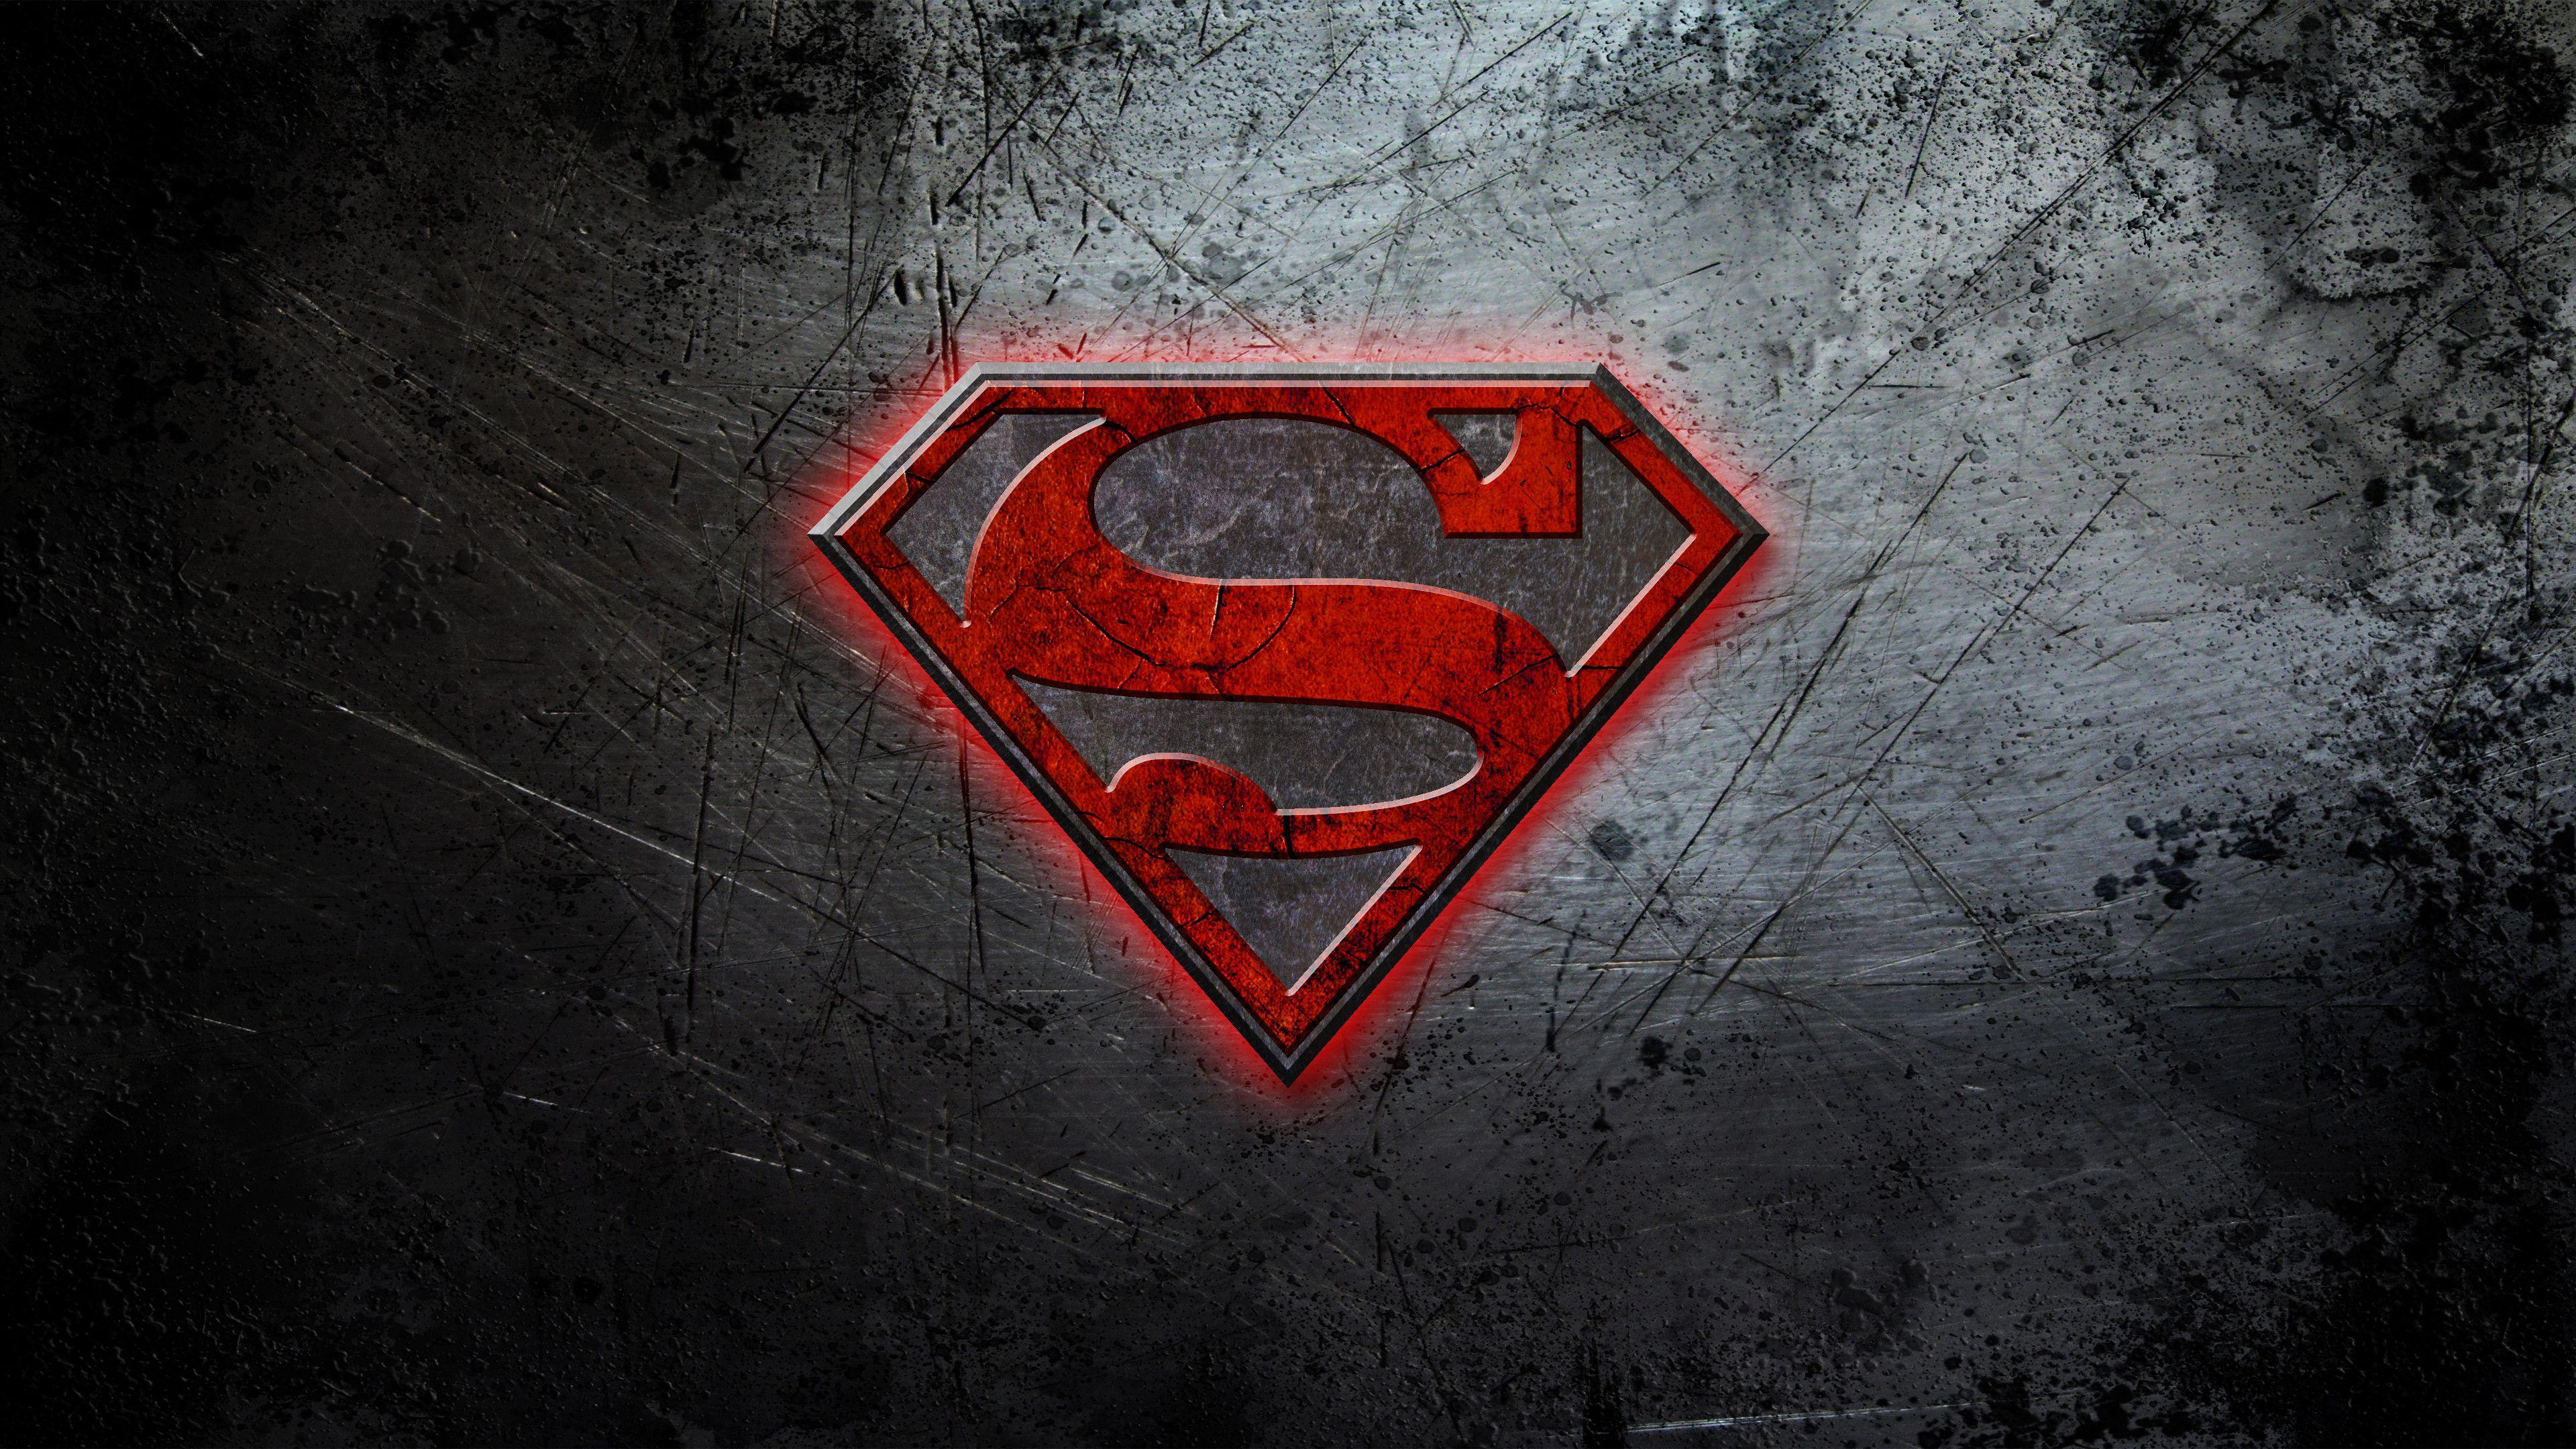 Wallpapers Superman - Wallpaper Cave